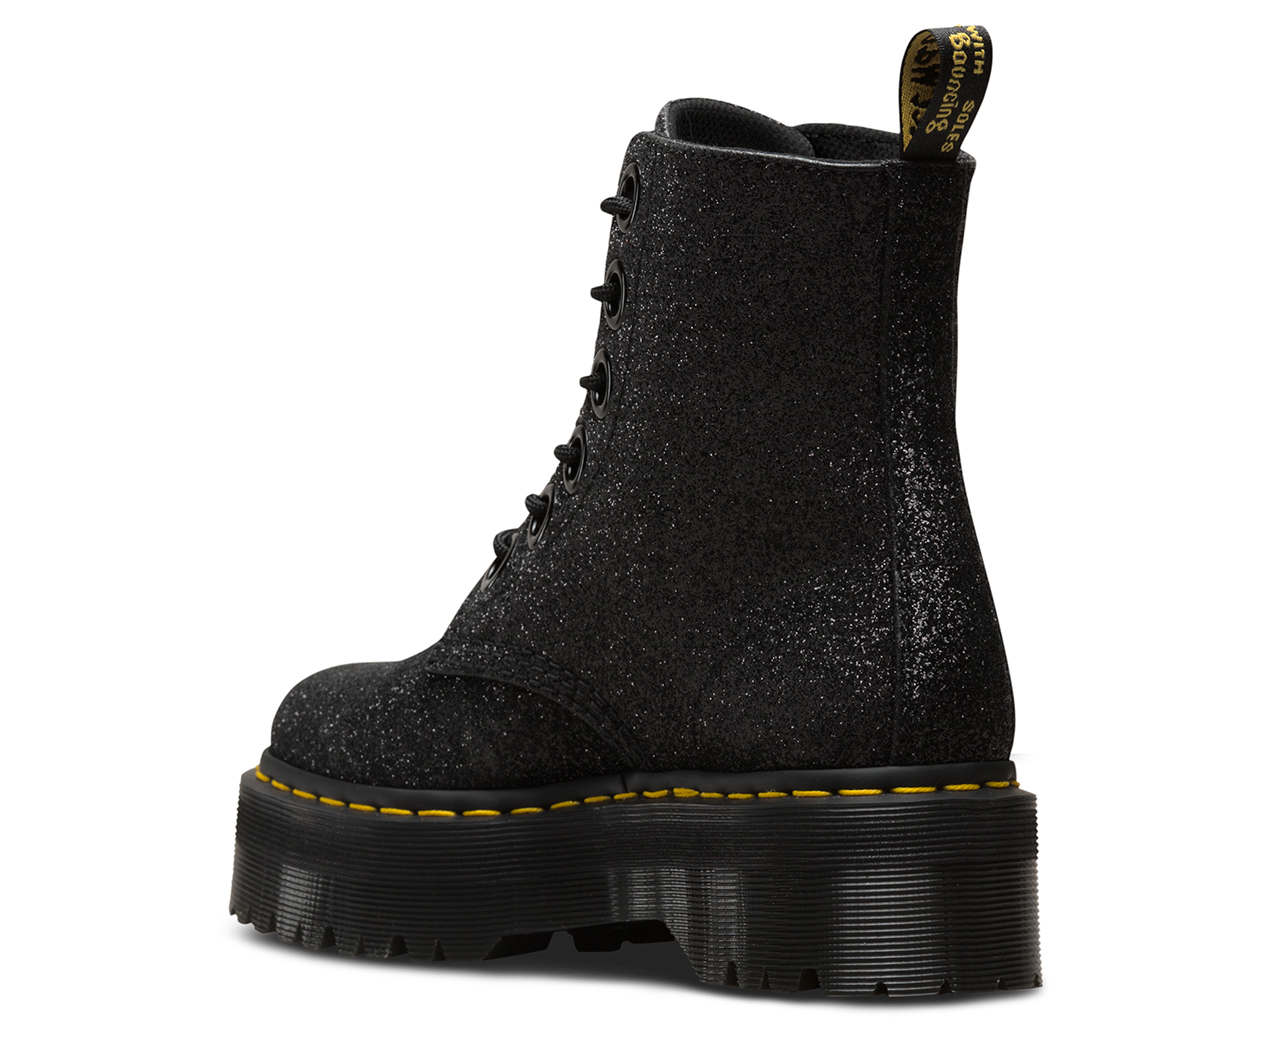 f3859a6cd Molly Glitter | Womens Boots | Official EU Dr Martens Store